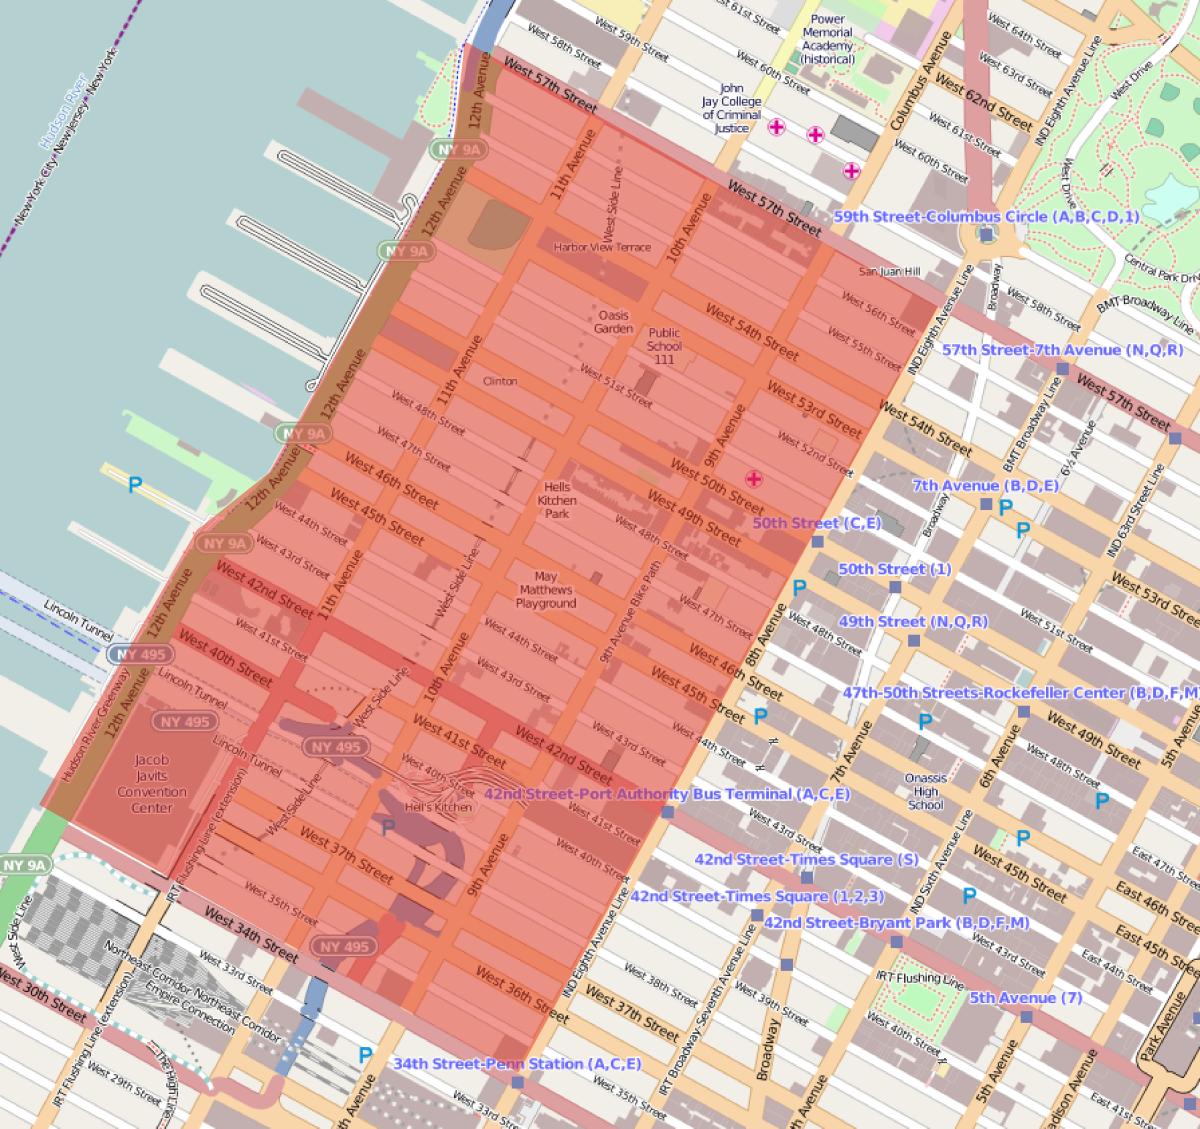 Location map of Hell's Kitchen in Manhattan.